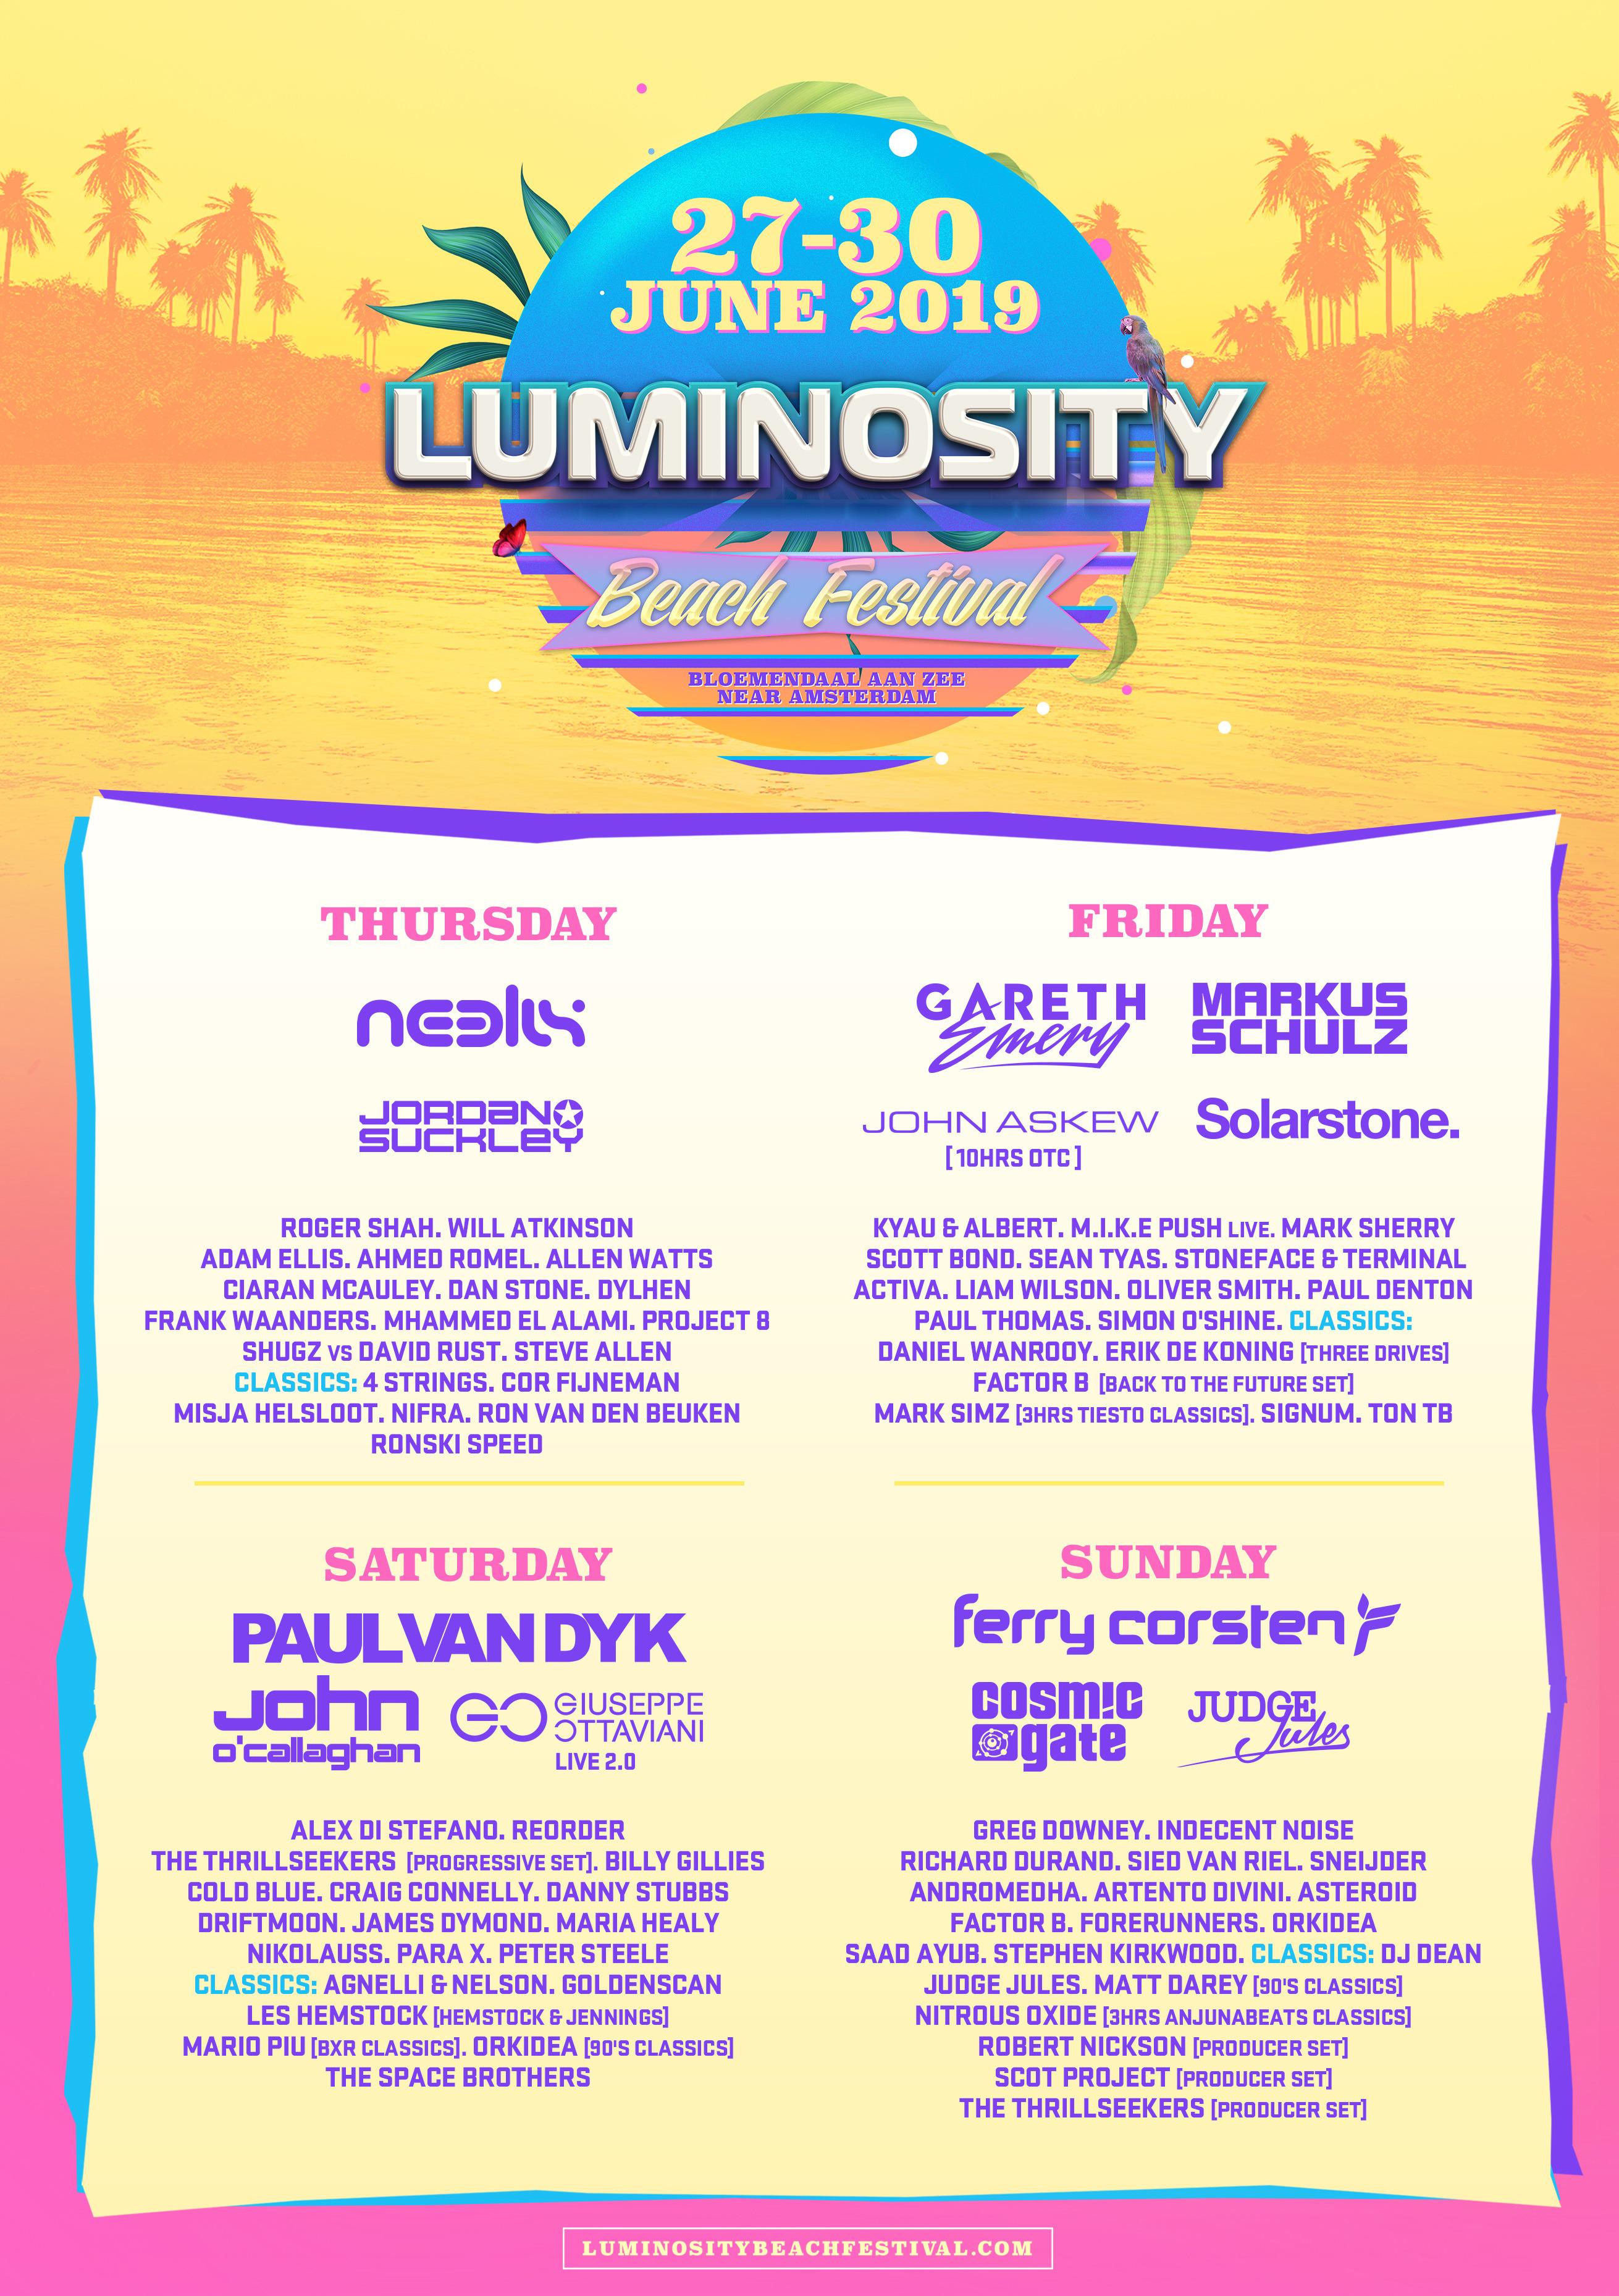 Luminosity Beach Festival 2019   Luminosity Events